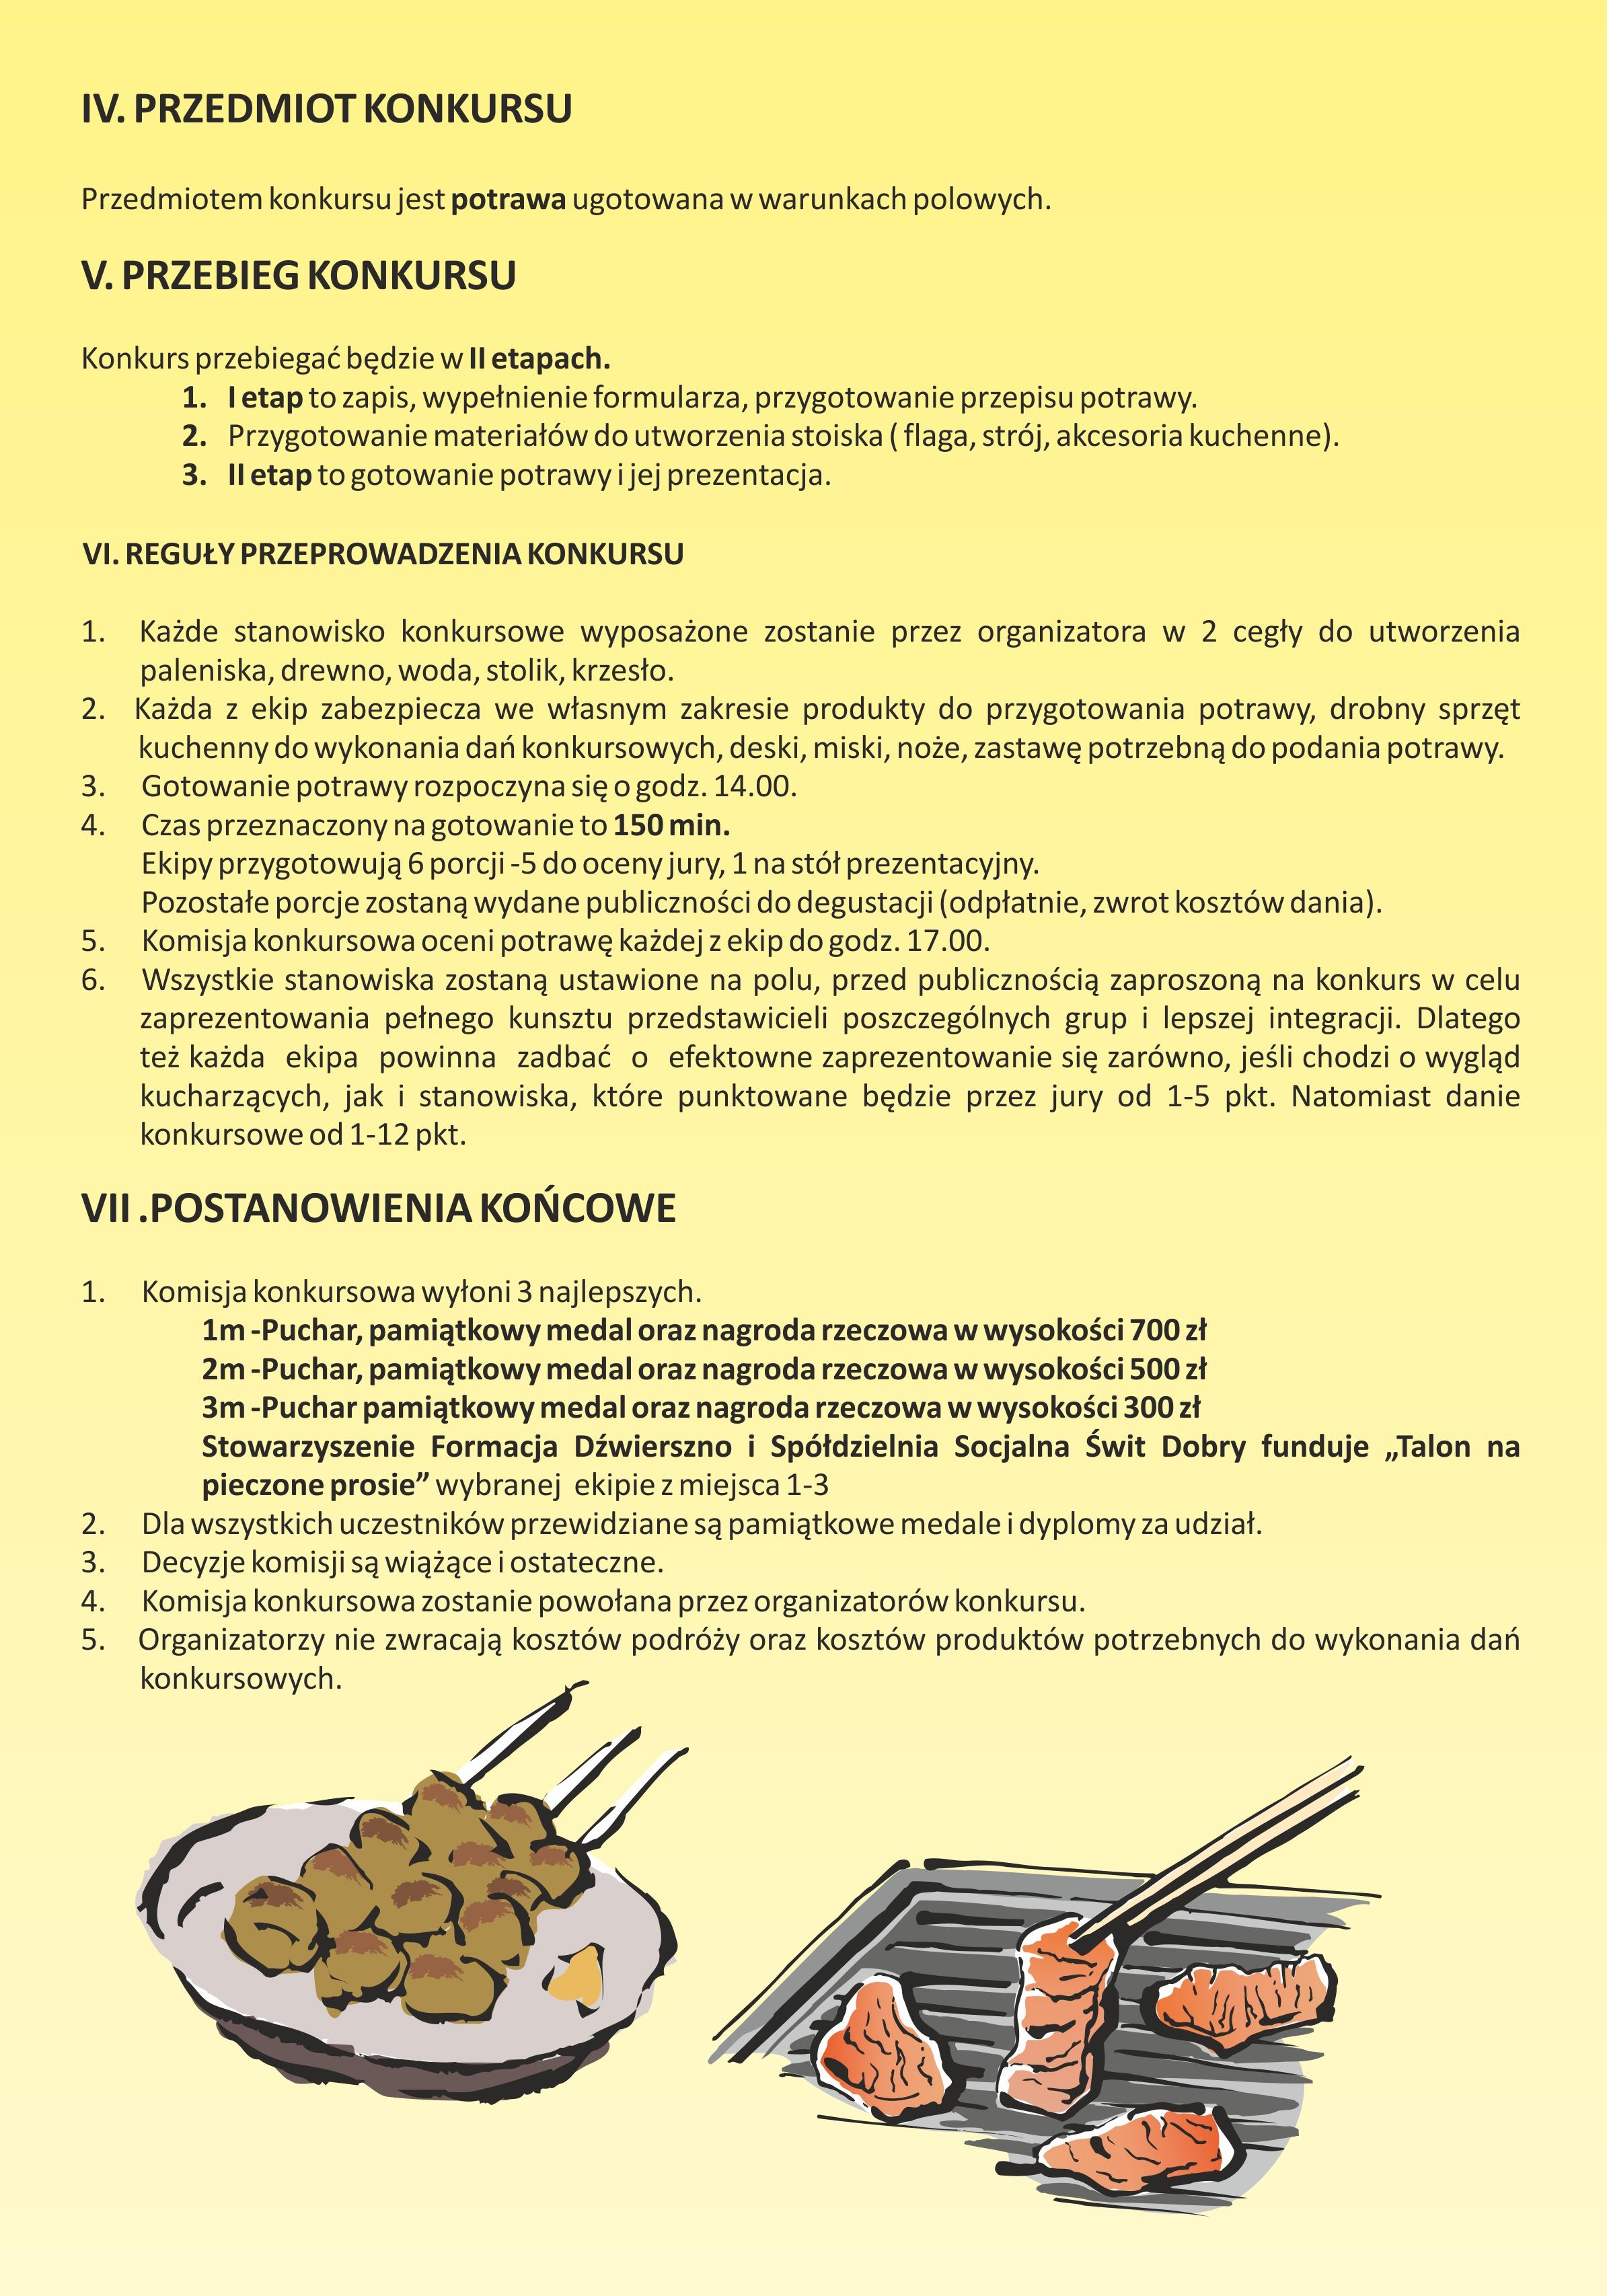 - regulamin_gotowanie2.jpg